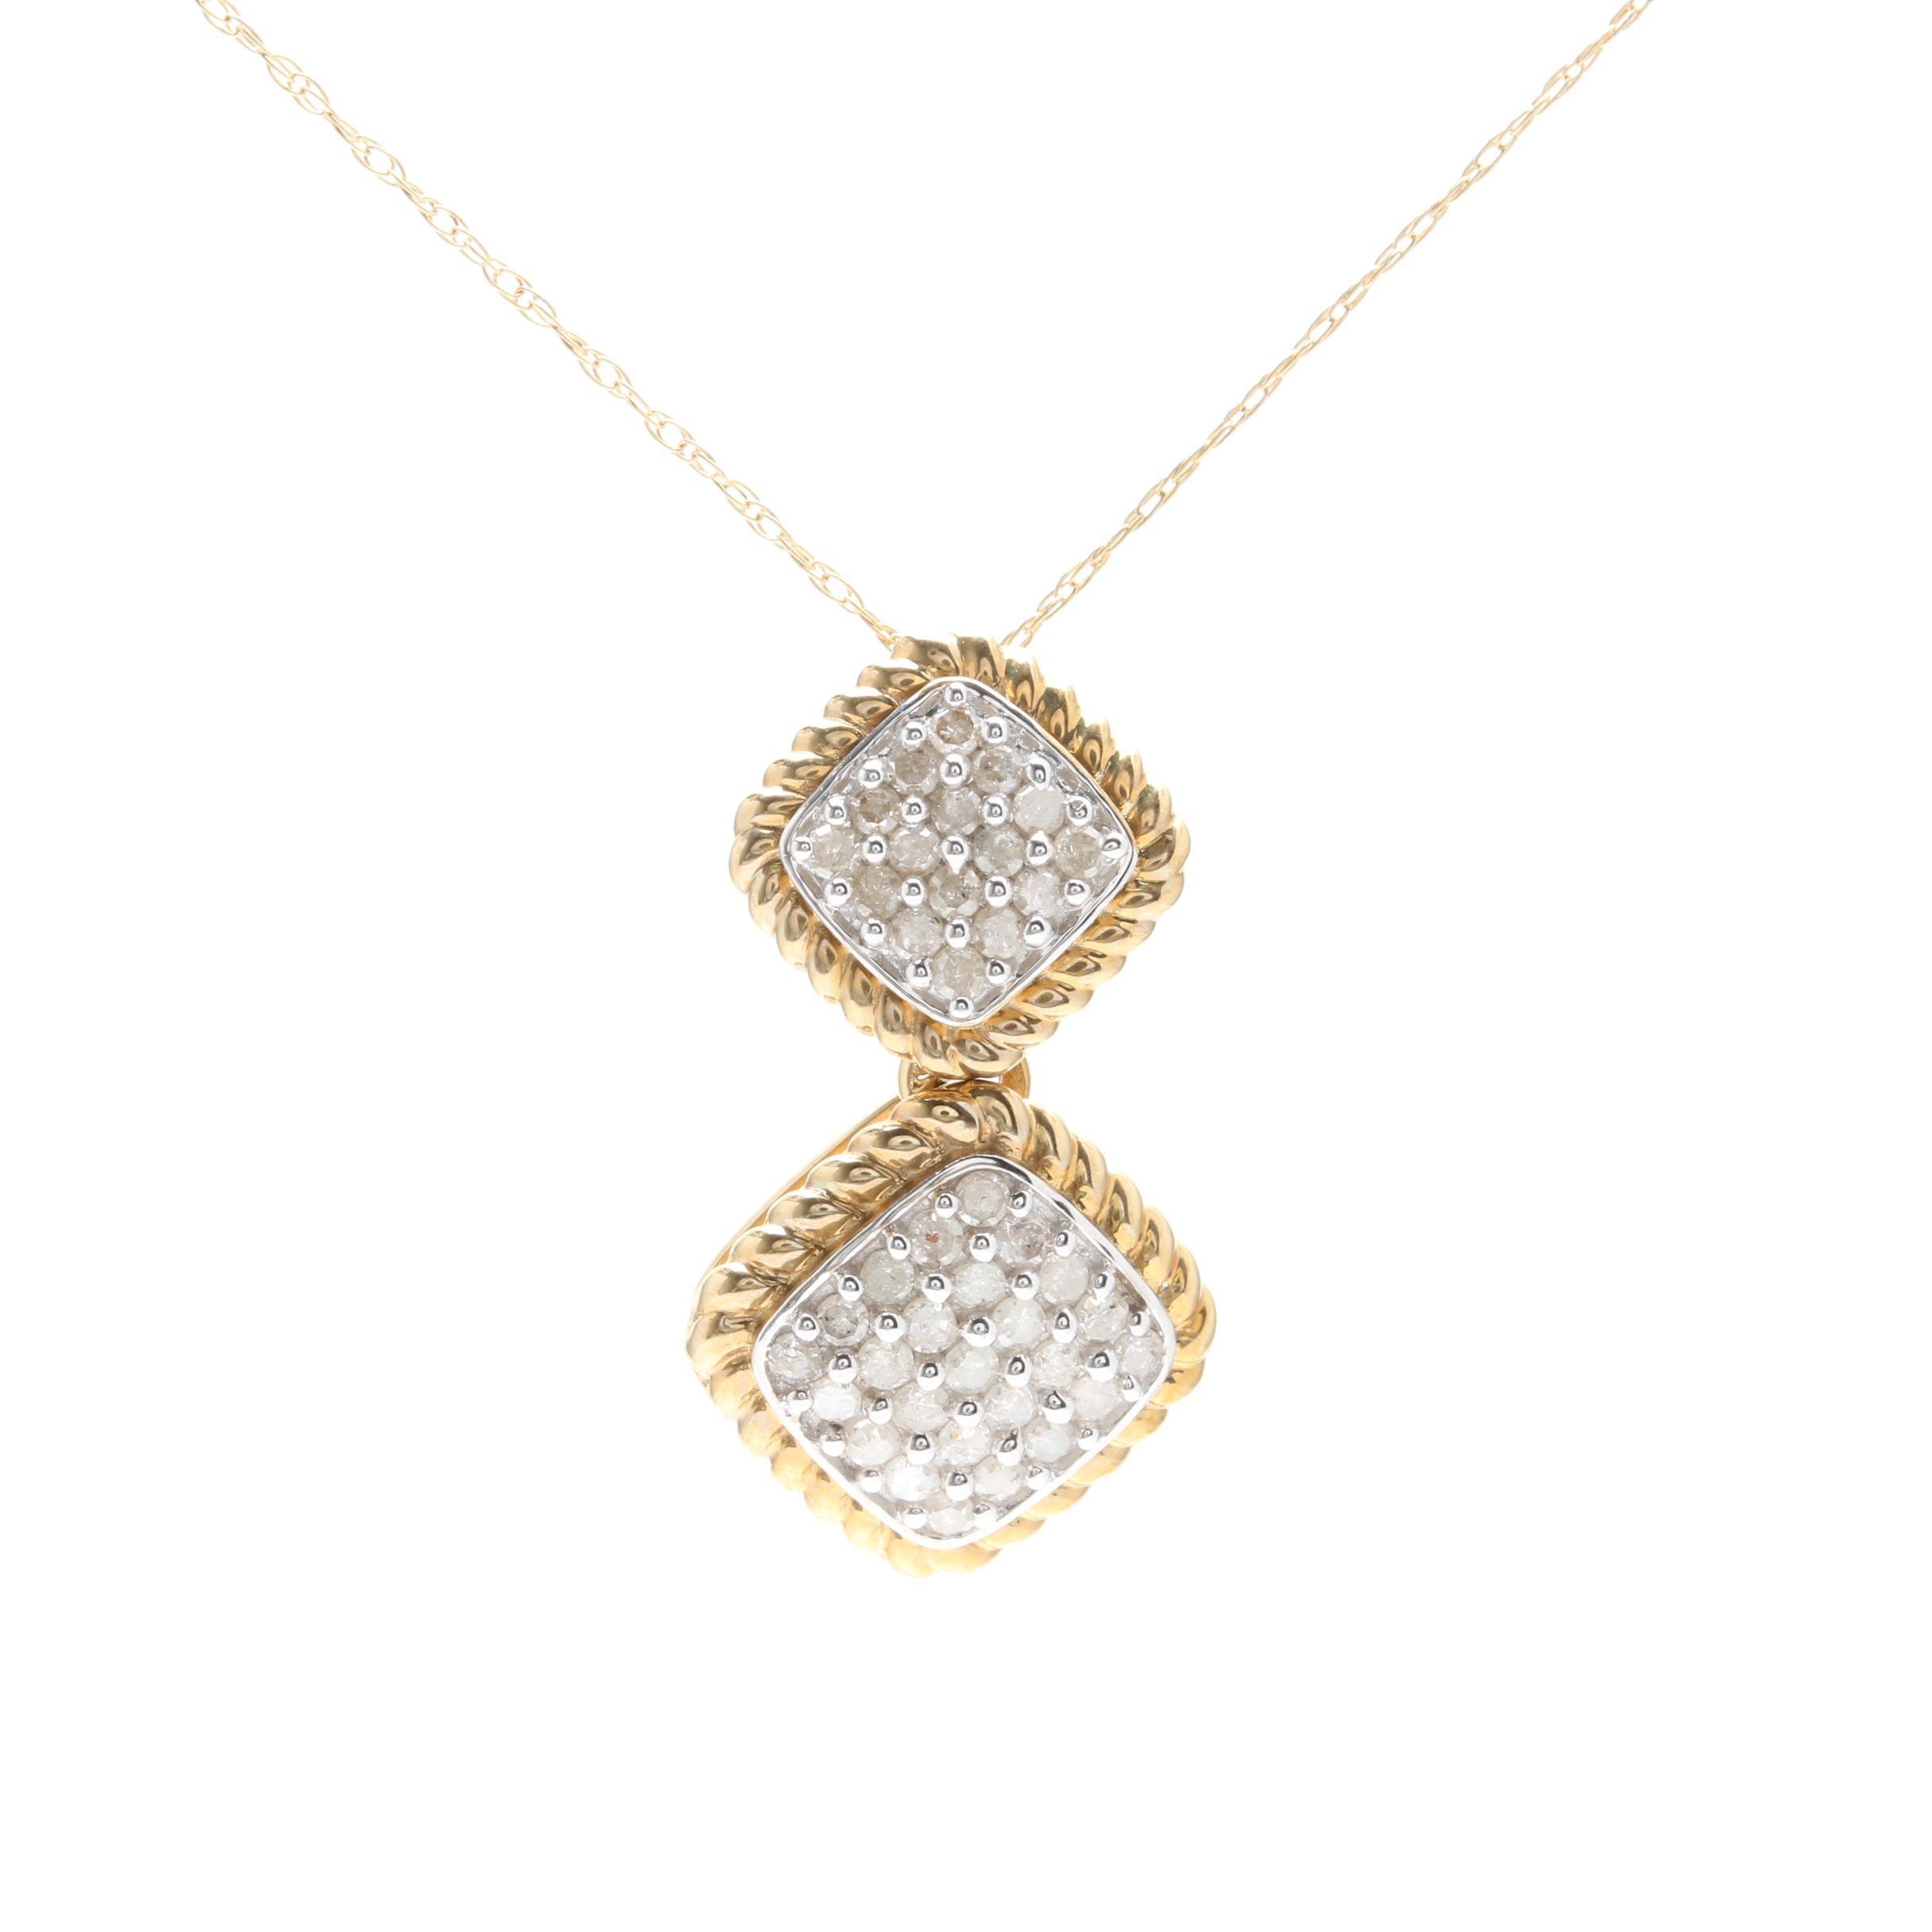 10K Yellow Gold Diamond Drop Pendant Necklace